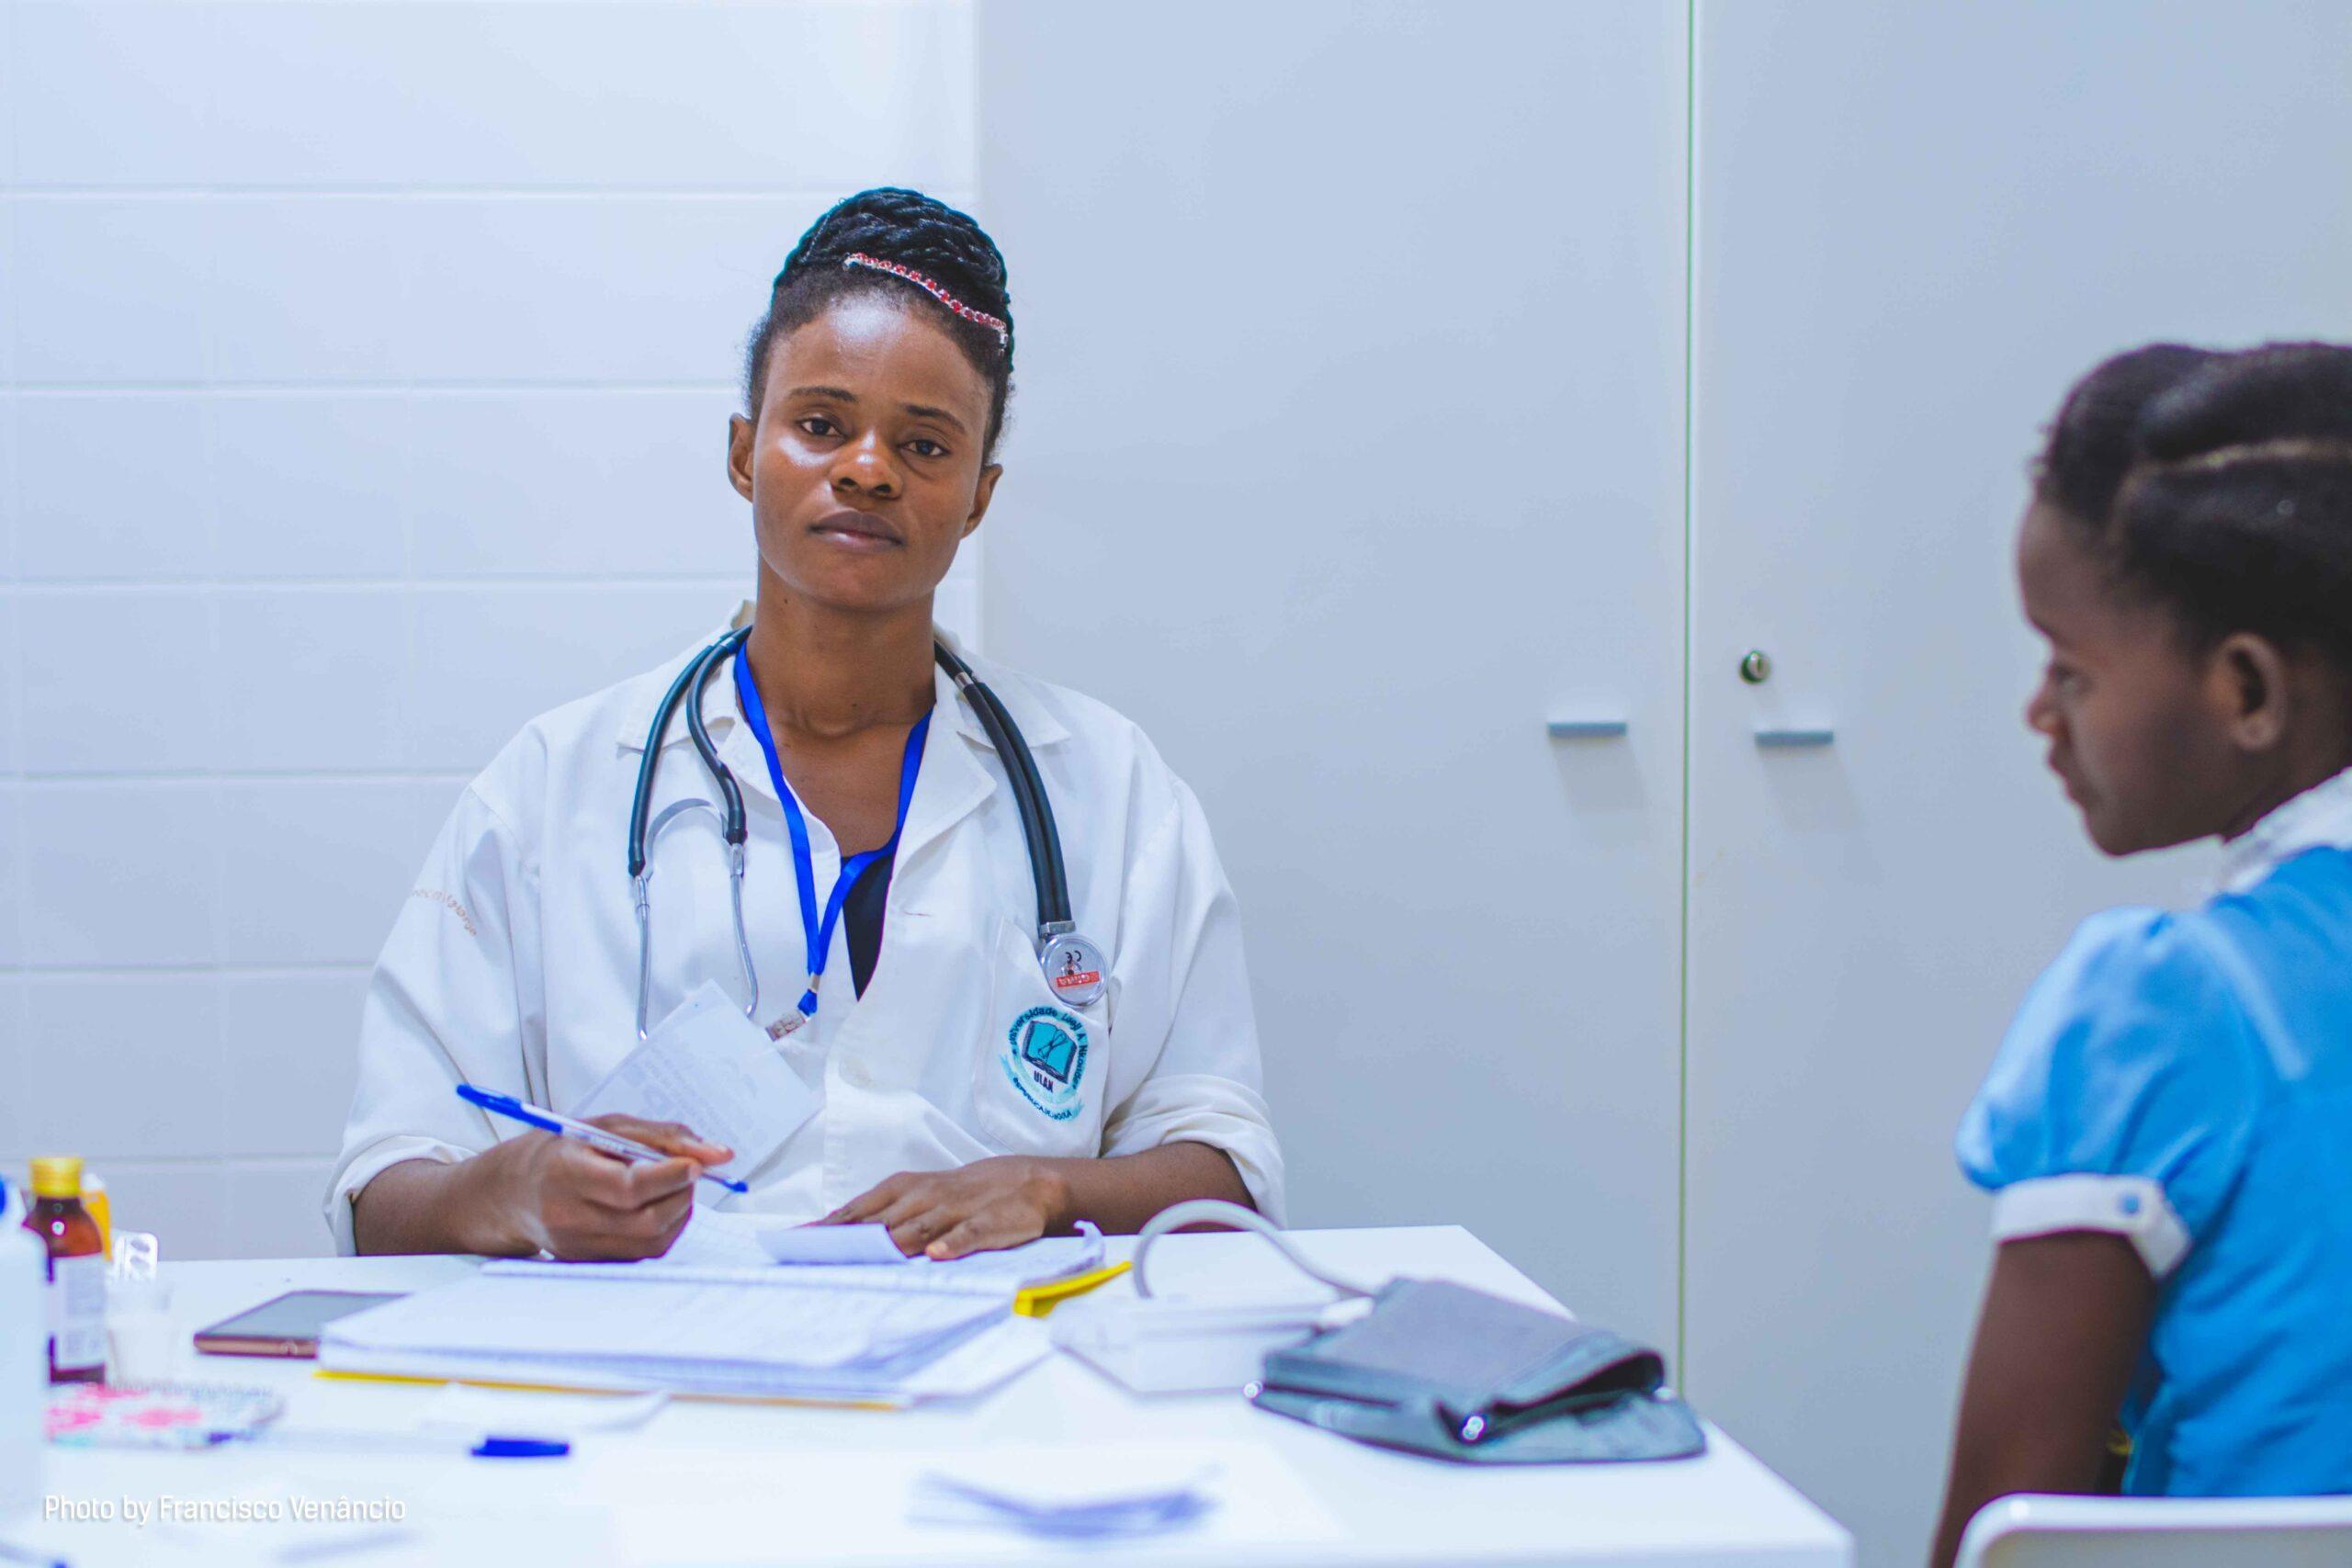 Dottoressa - Solitudine